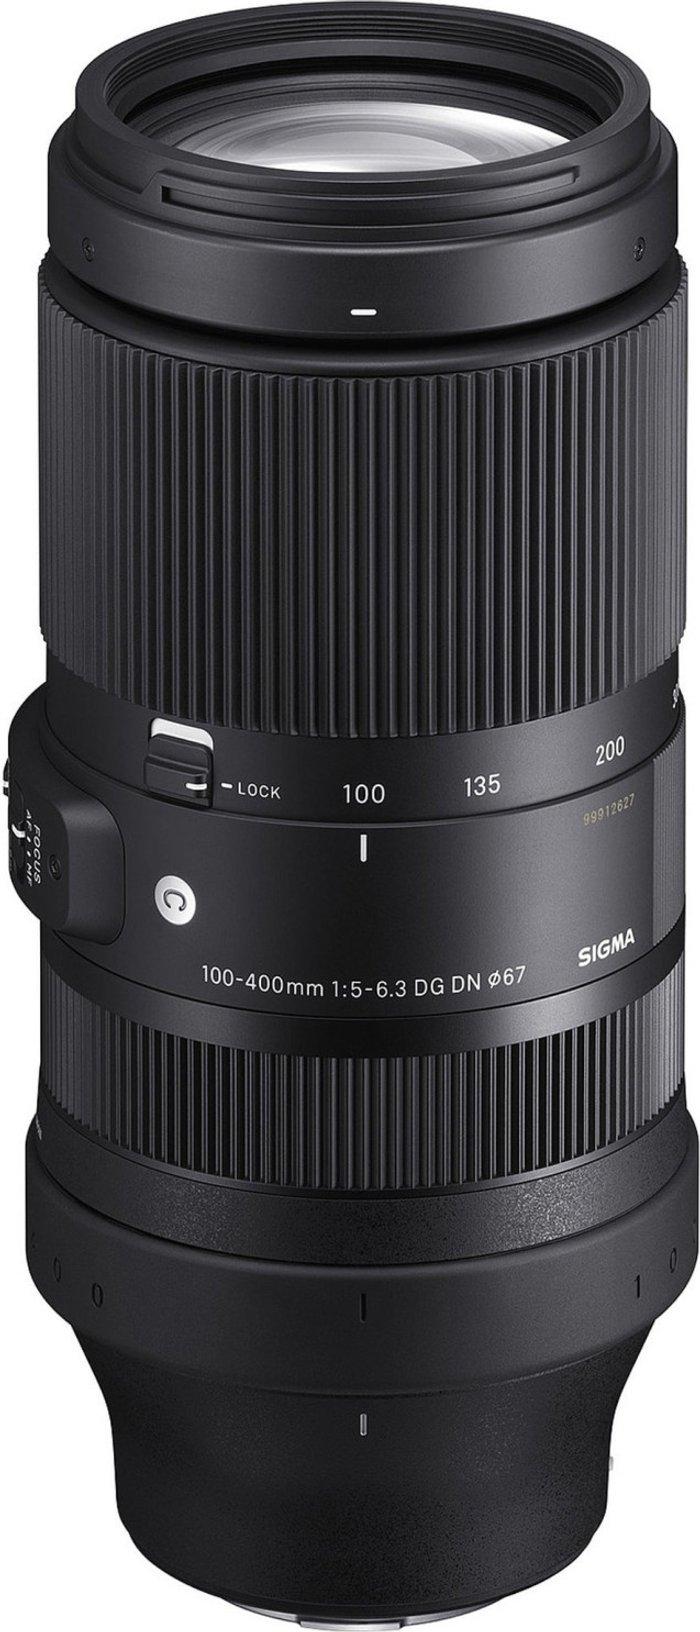 Sigma Sigma 100-400mm f5-6.3 DG DN OS Contemporary Sony E